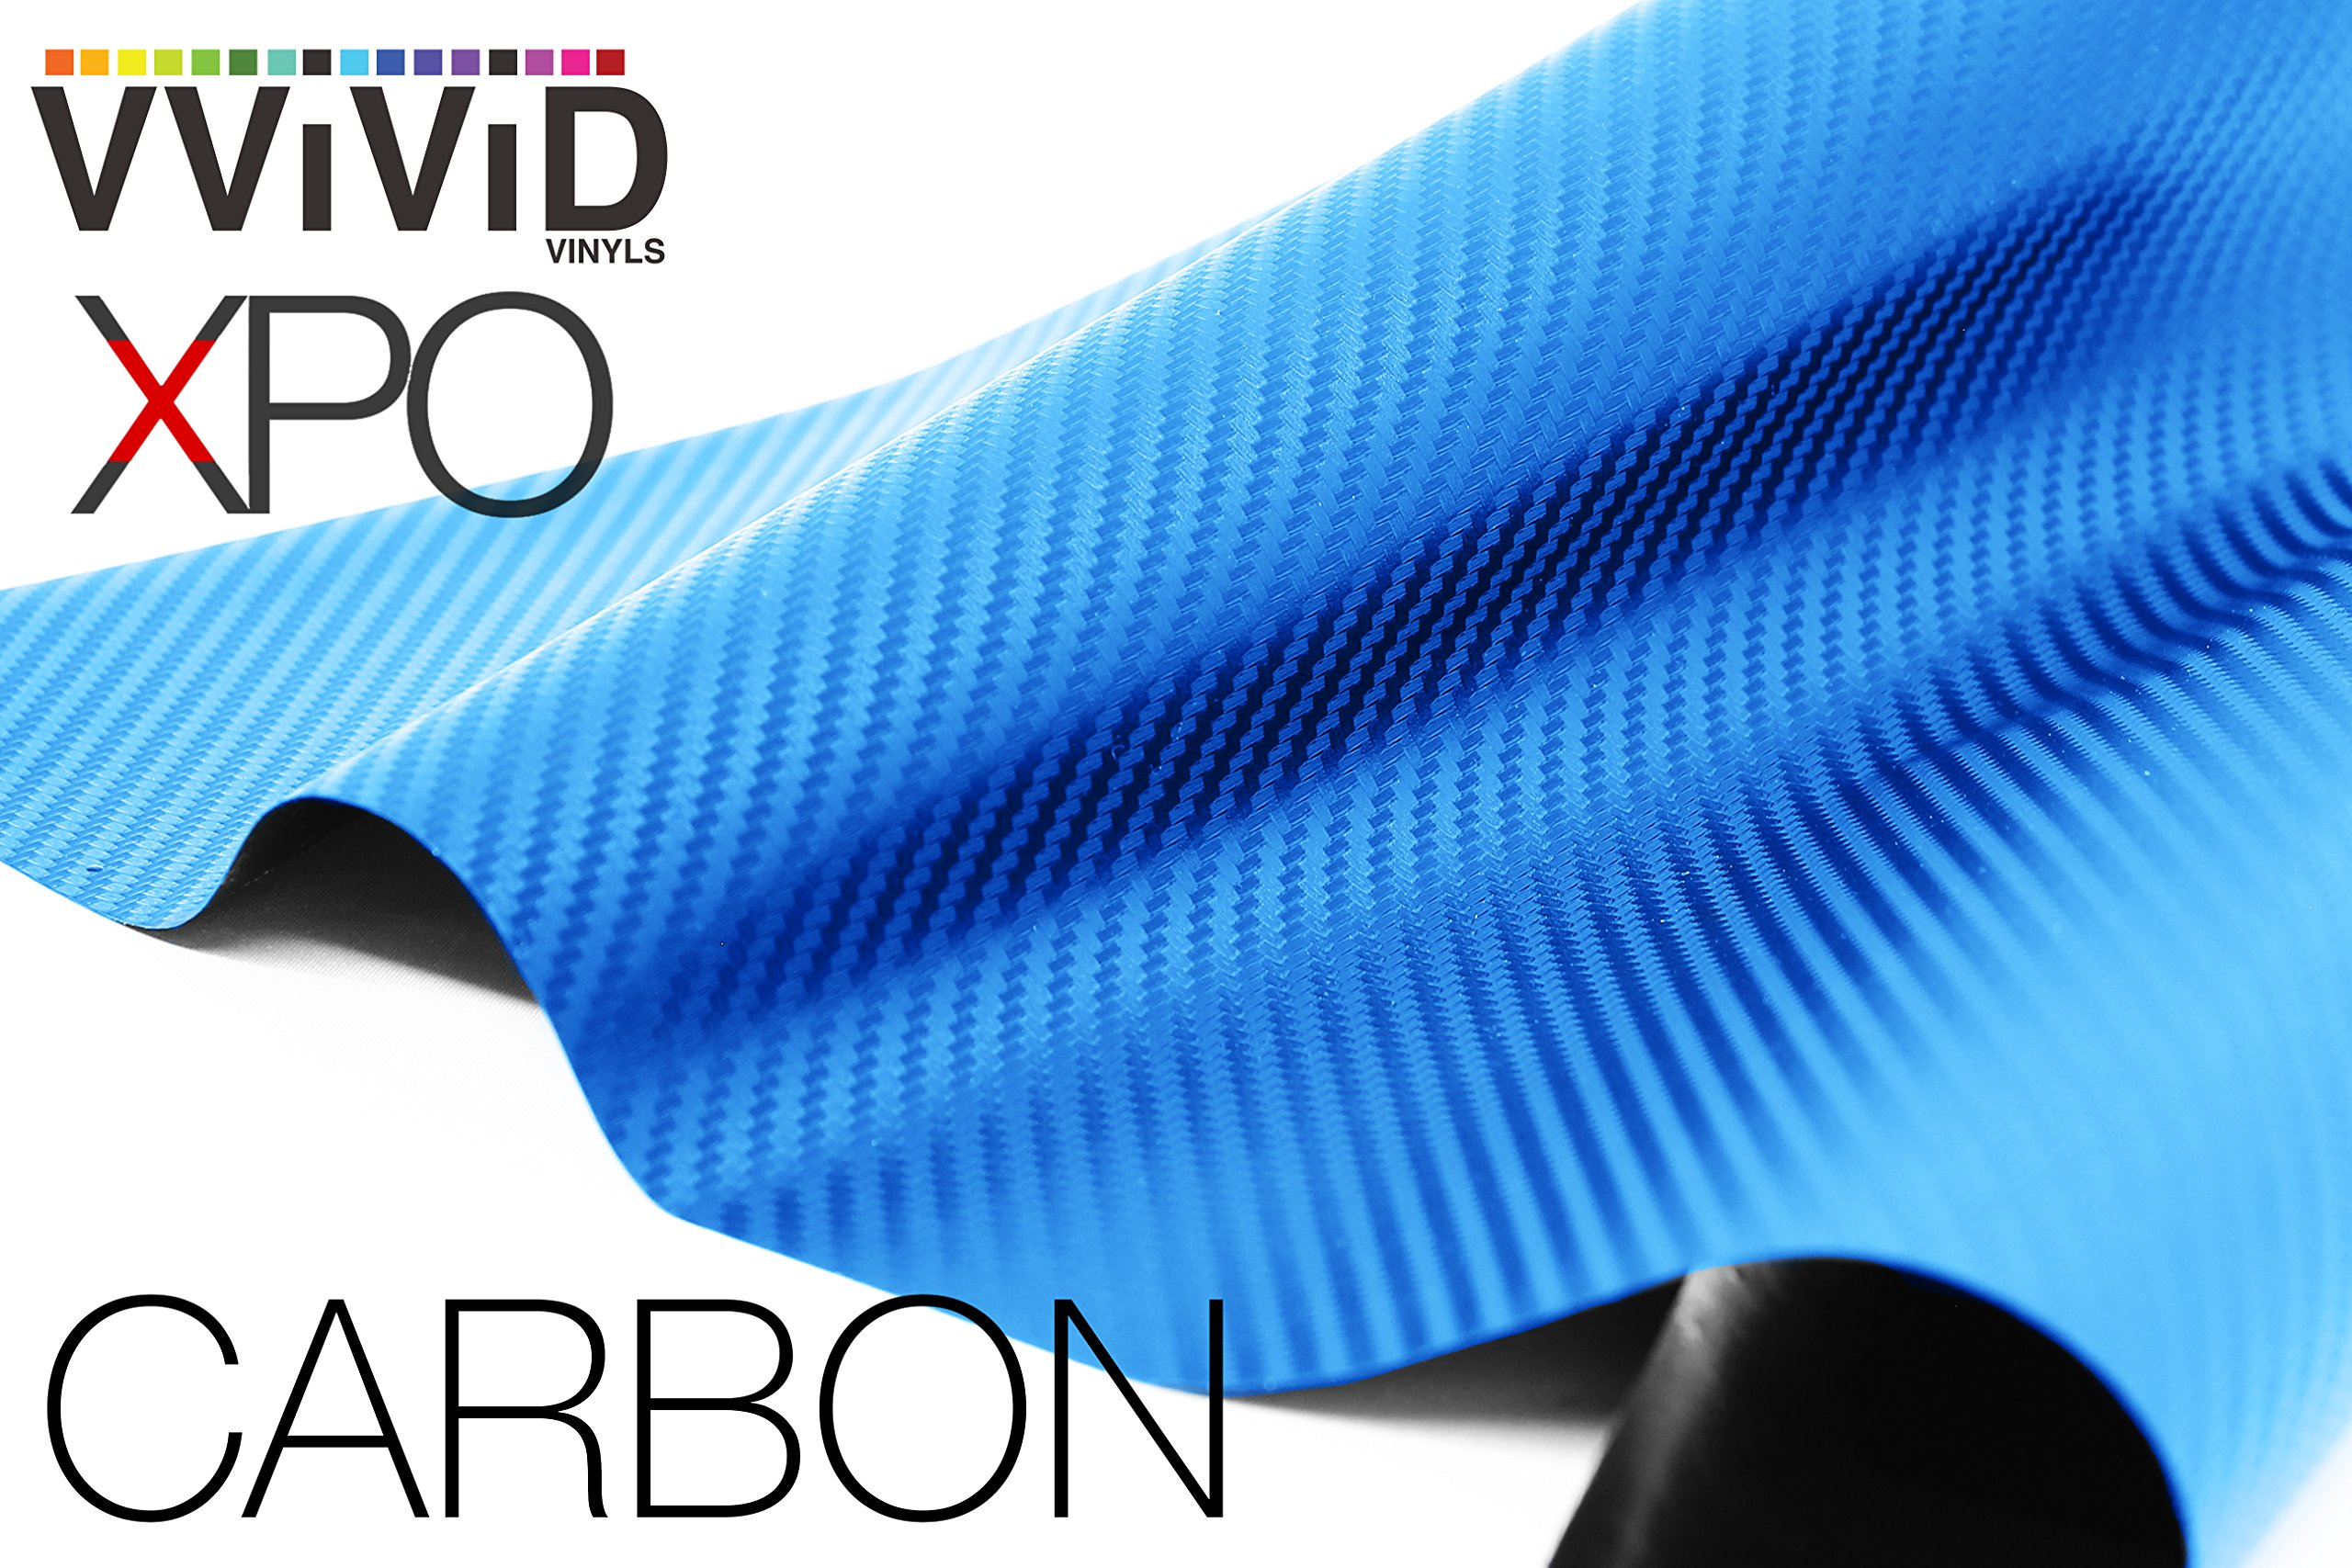 VViViD XPO Electric Blue 3D Carbon Fiber Vinyl Wrap Roll with Air Release Technology (25ft x 5ft)